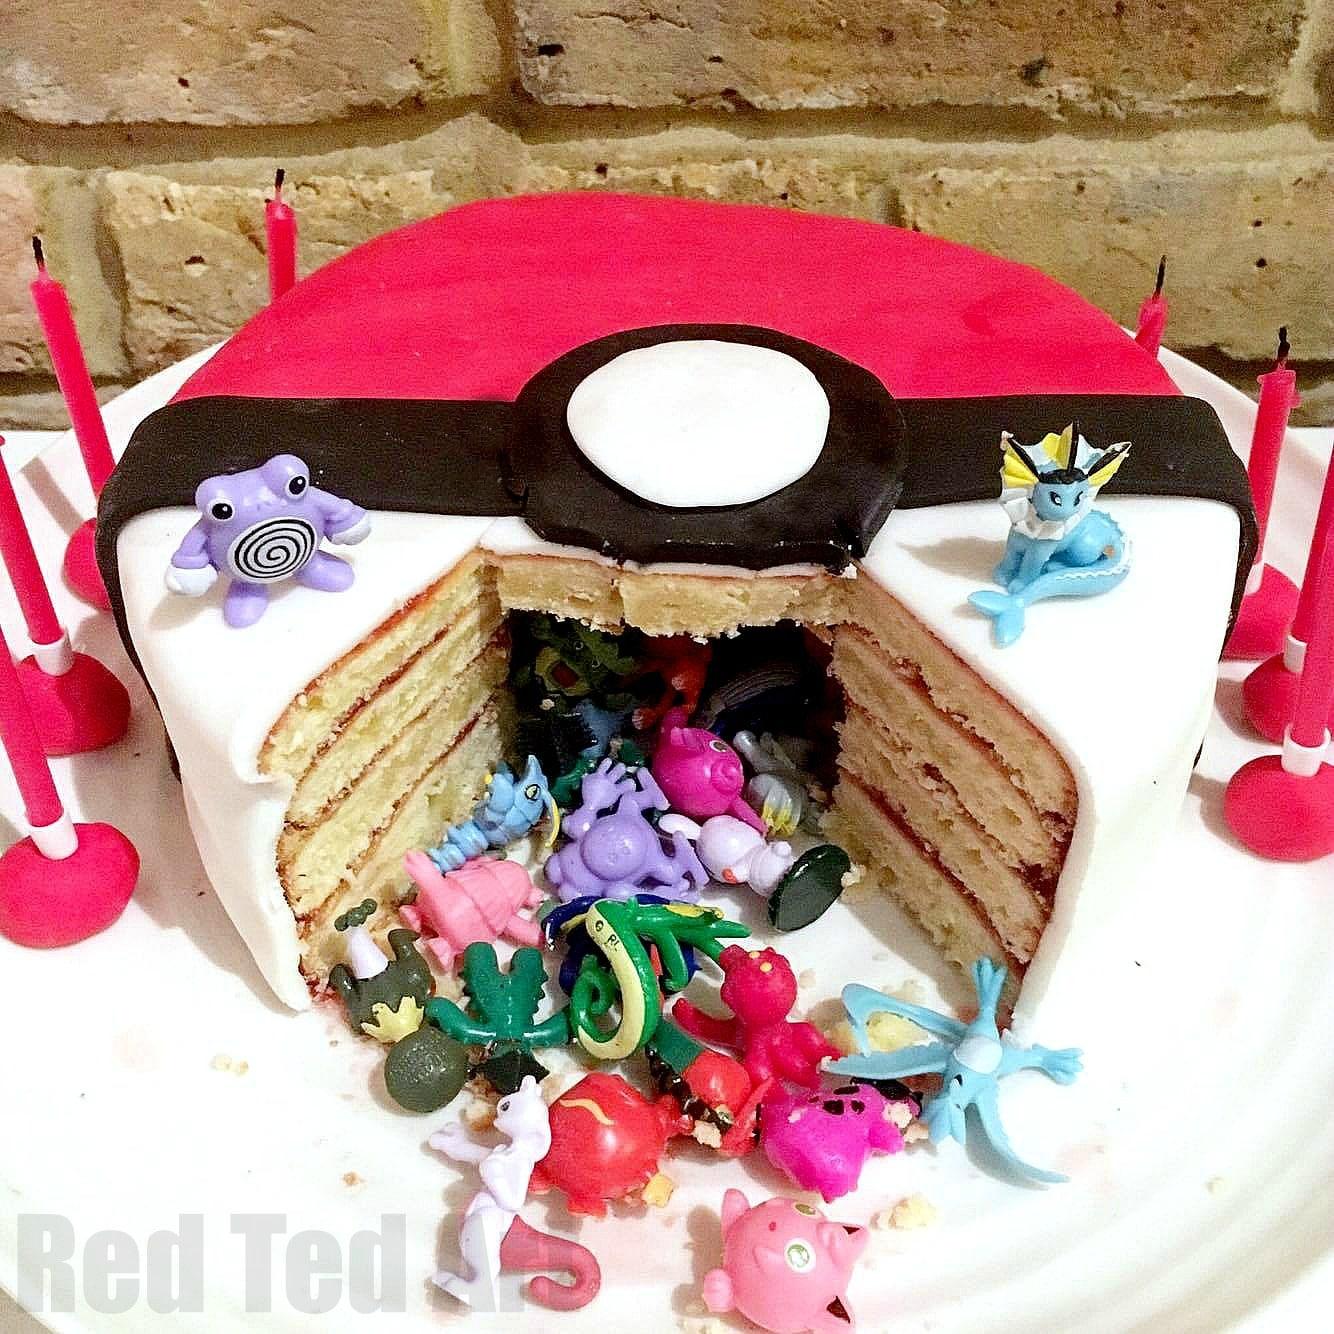 DIY Pokemon Cake Surprise - Red Ted Art's Blog - photo#36